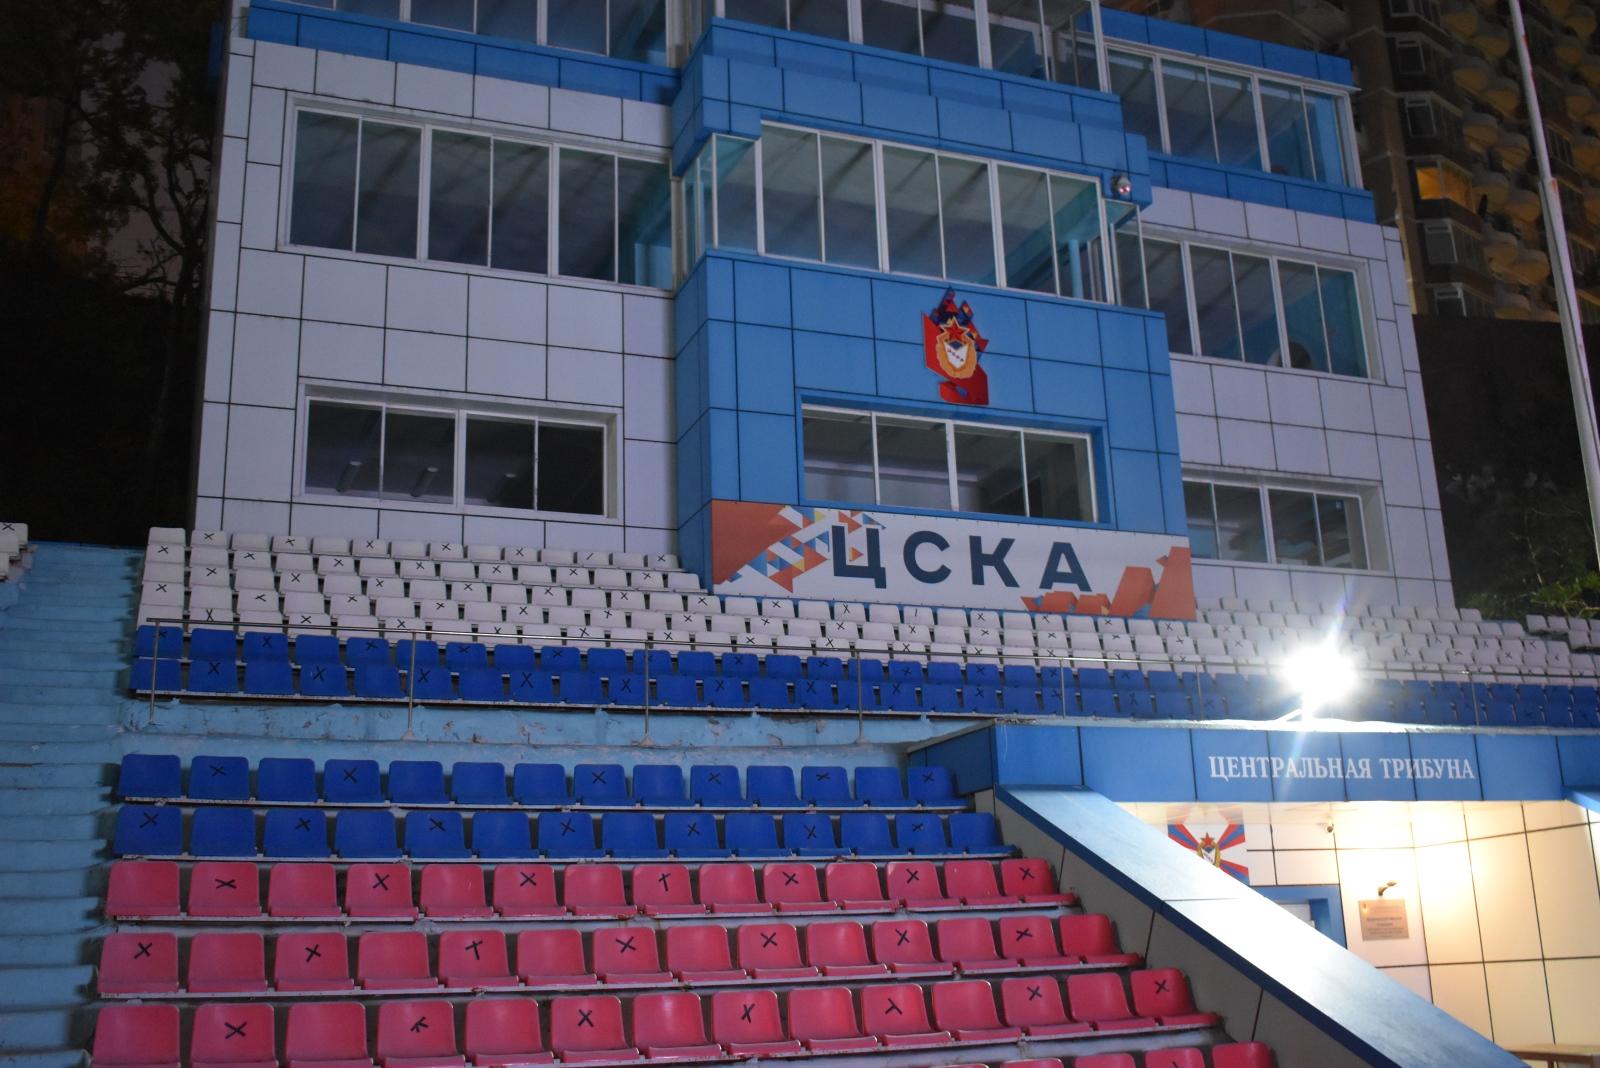 Матчи Евро-2020. Новости футбола. Футбол Владивостока. Россия - Дания во Владивостоке.